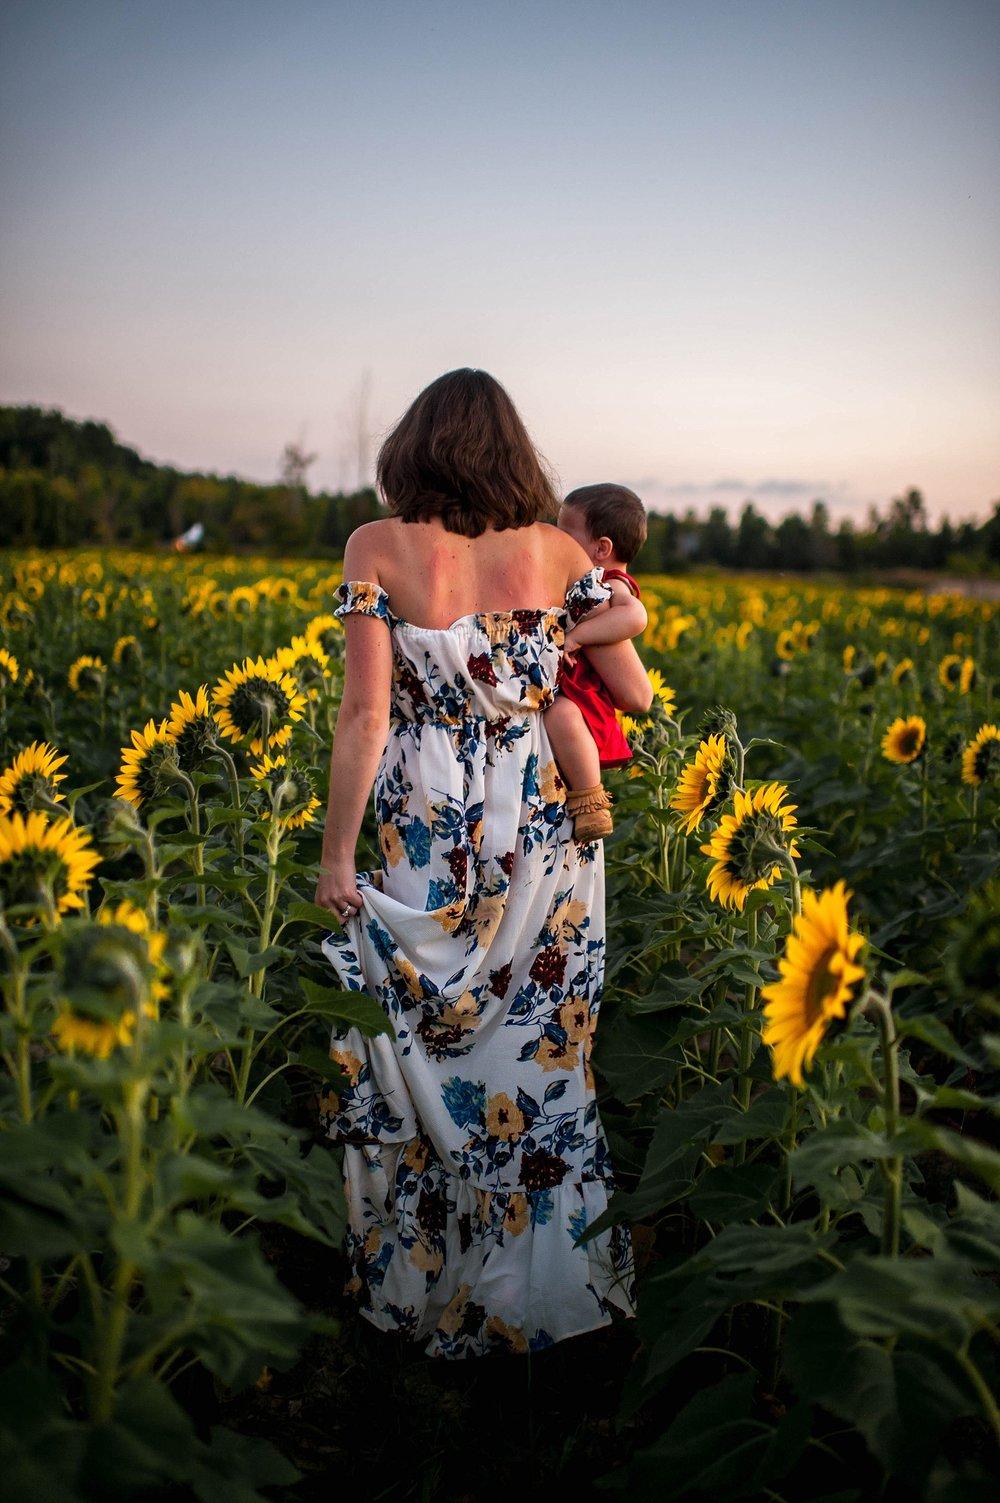 lauren-grayson-photography-cleveland-ohio-photographer-sunflower-fields-sunset-golden-hour-photo-shoot-mommy-and-me-family-child-photographer_0588.jpg